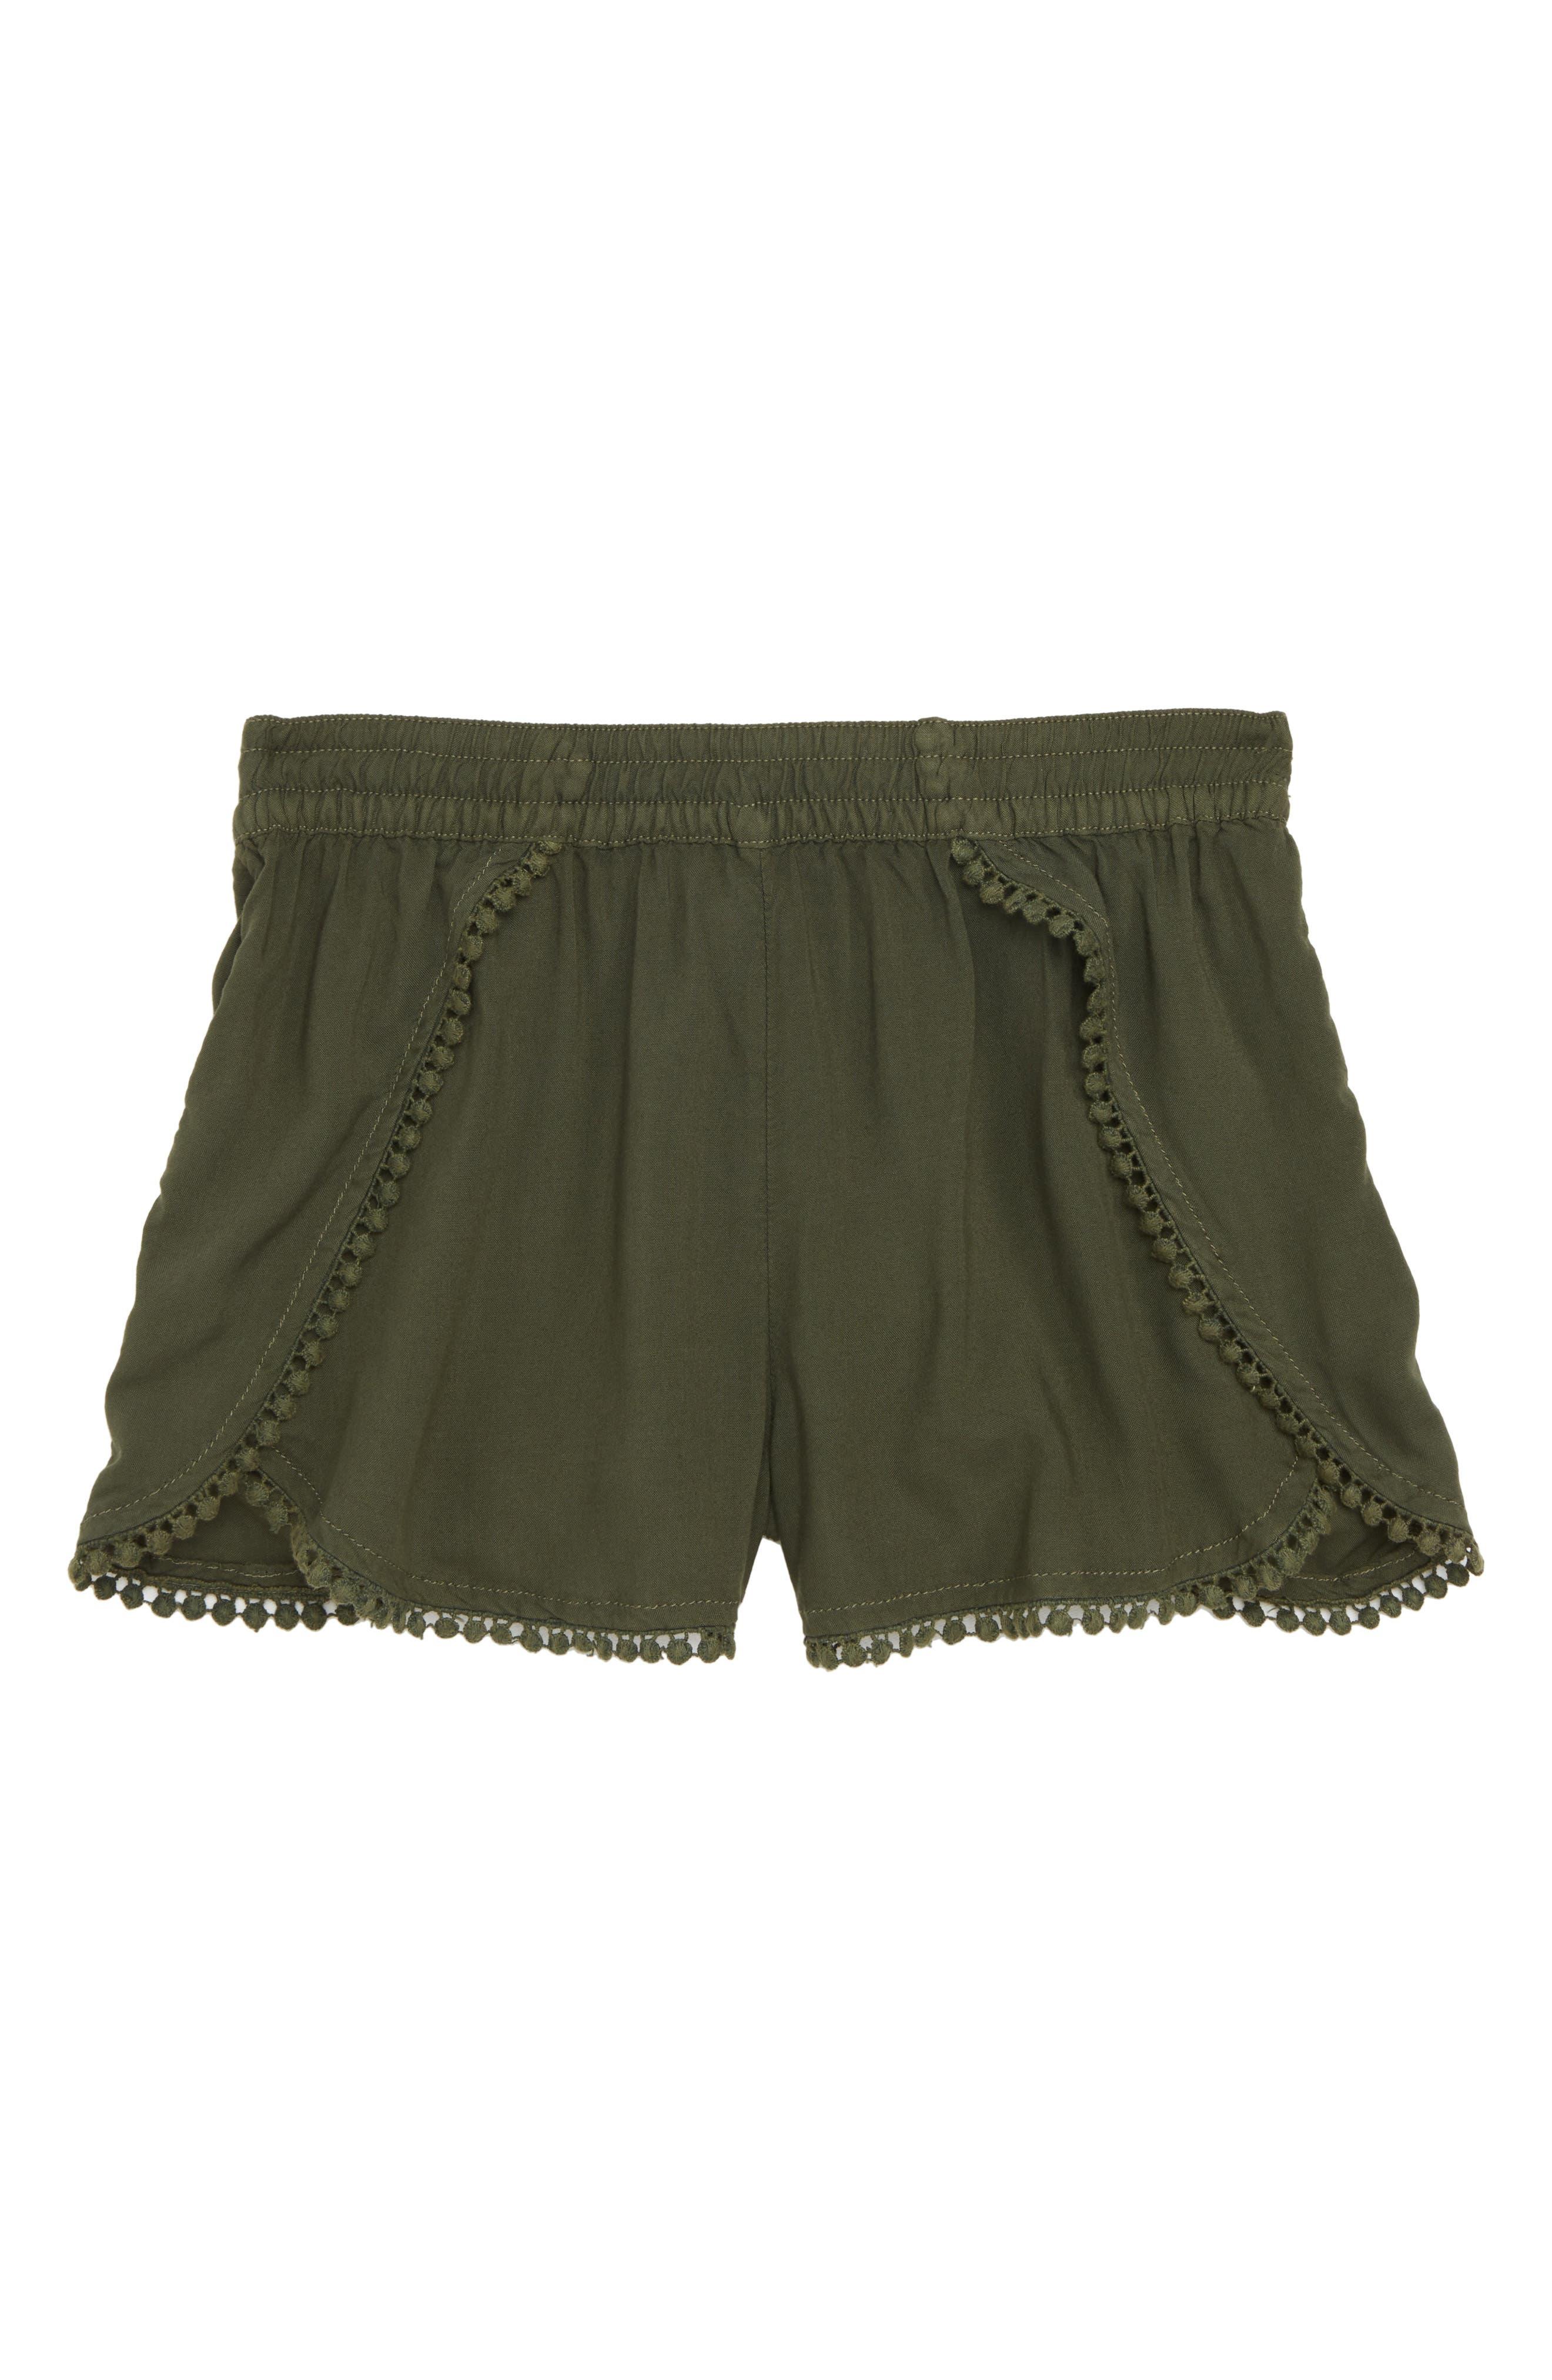 Alternate Image 1 Selected - Tucker + Tate Petal Shorts (Big Girls)